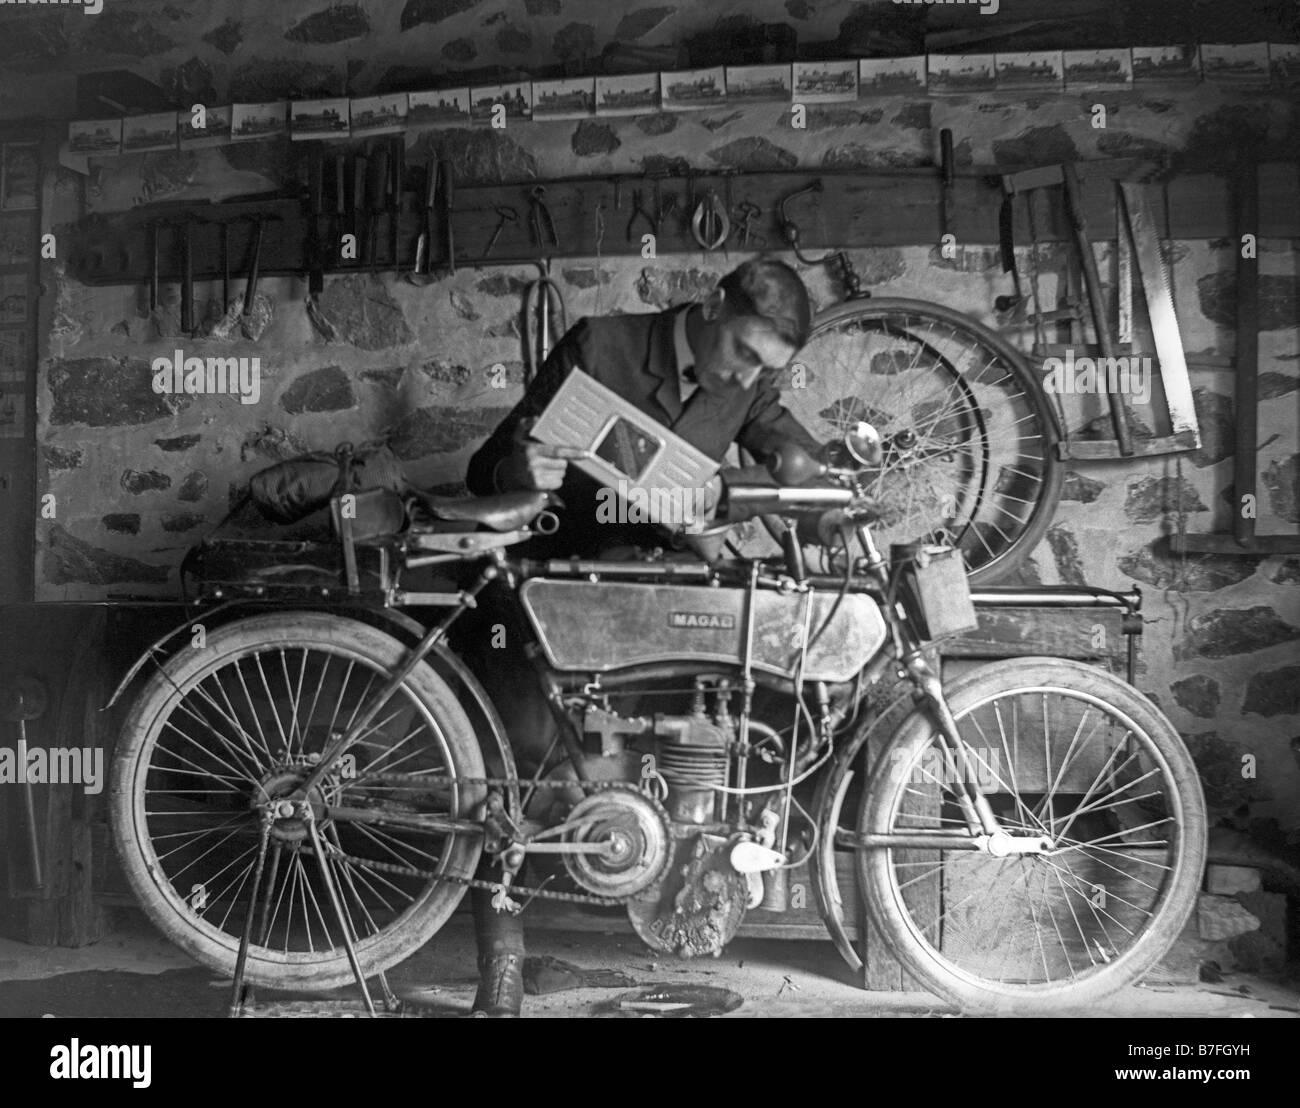 moto ancienne old motorbike year 1900 france - Stock Image